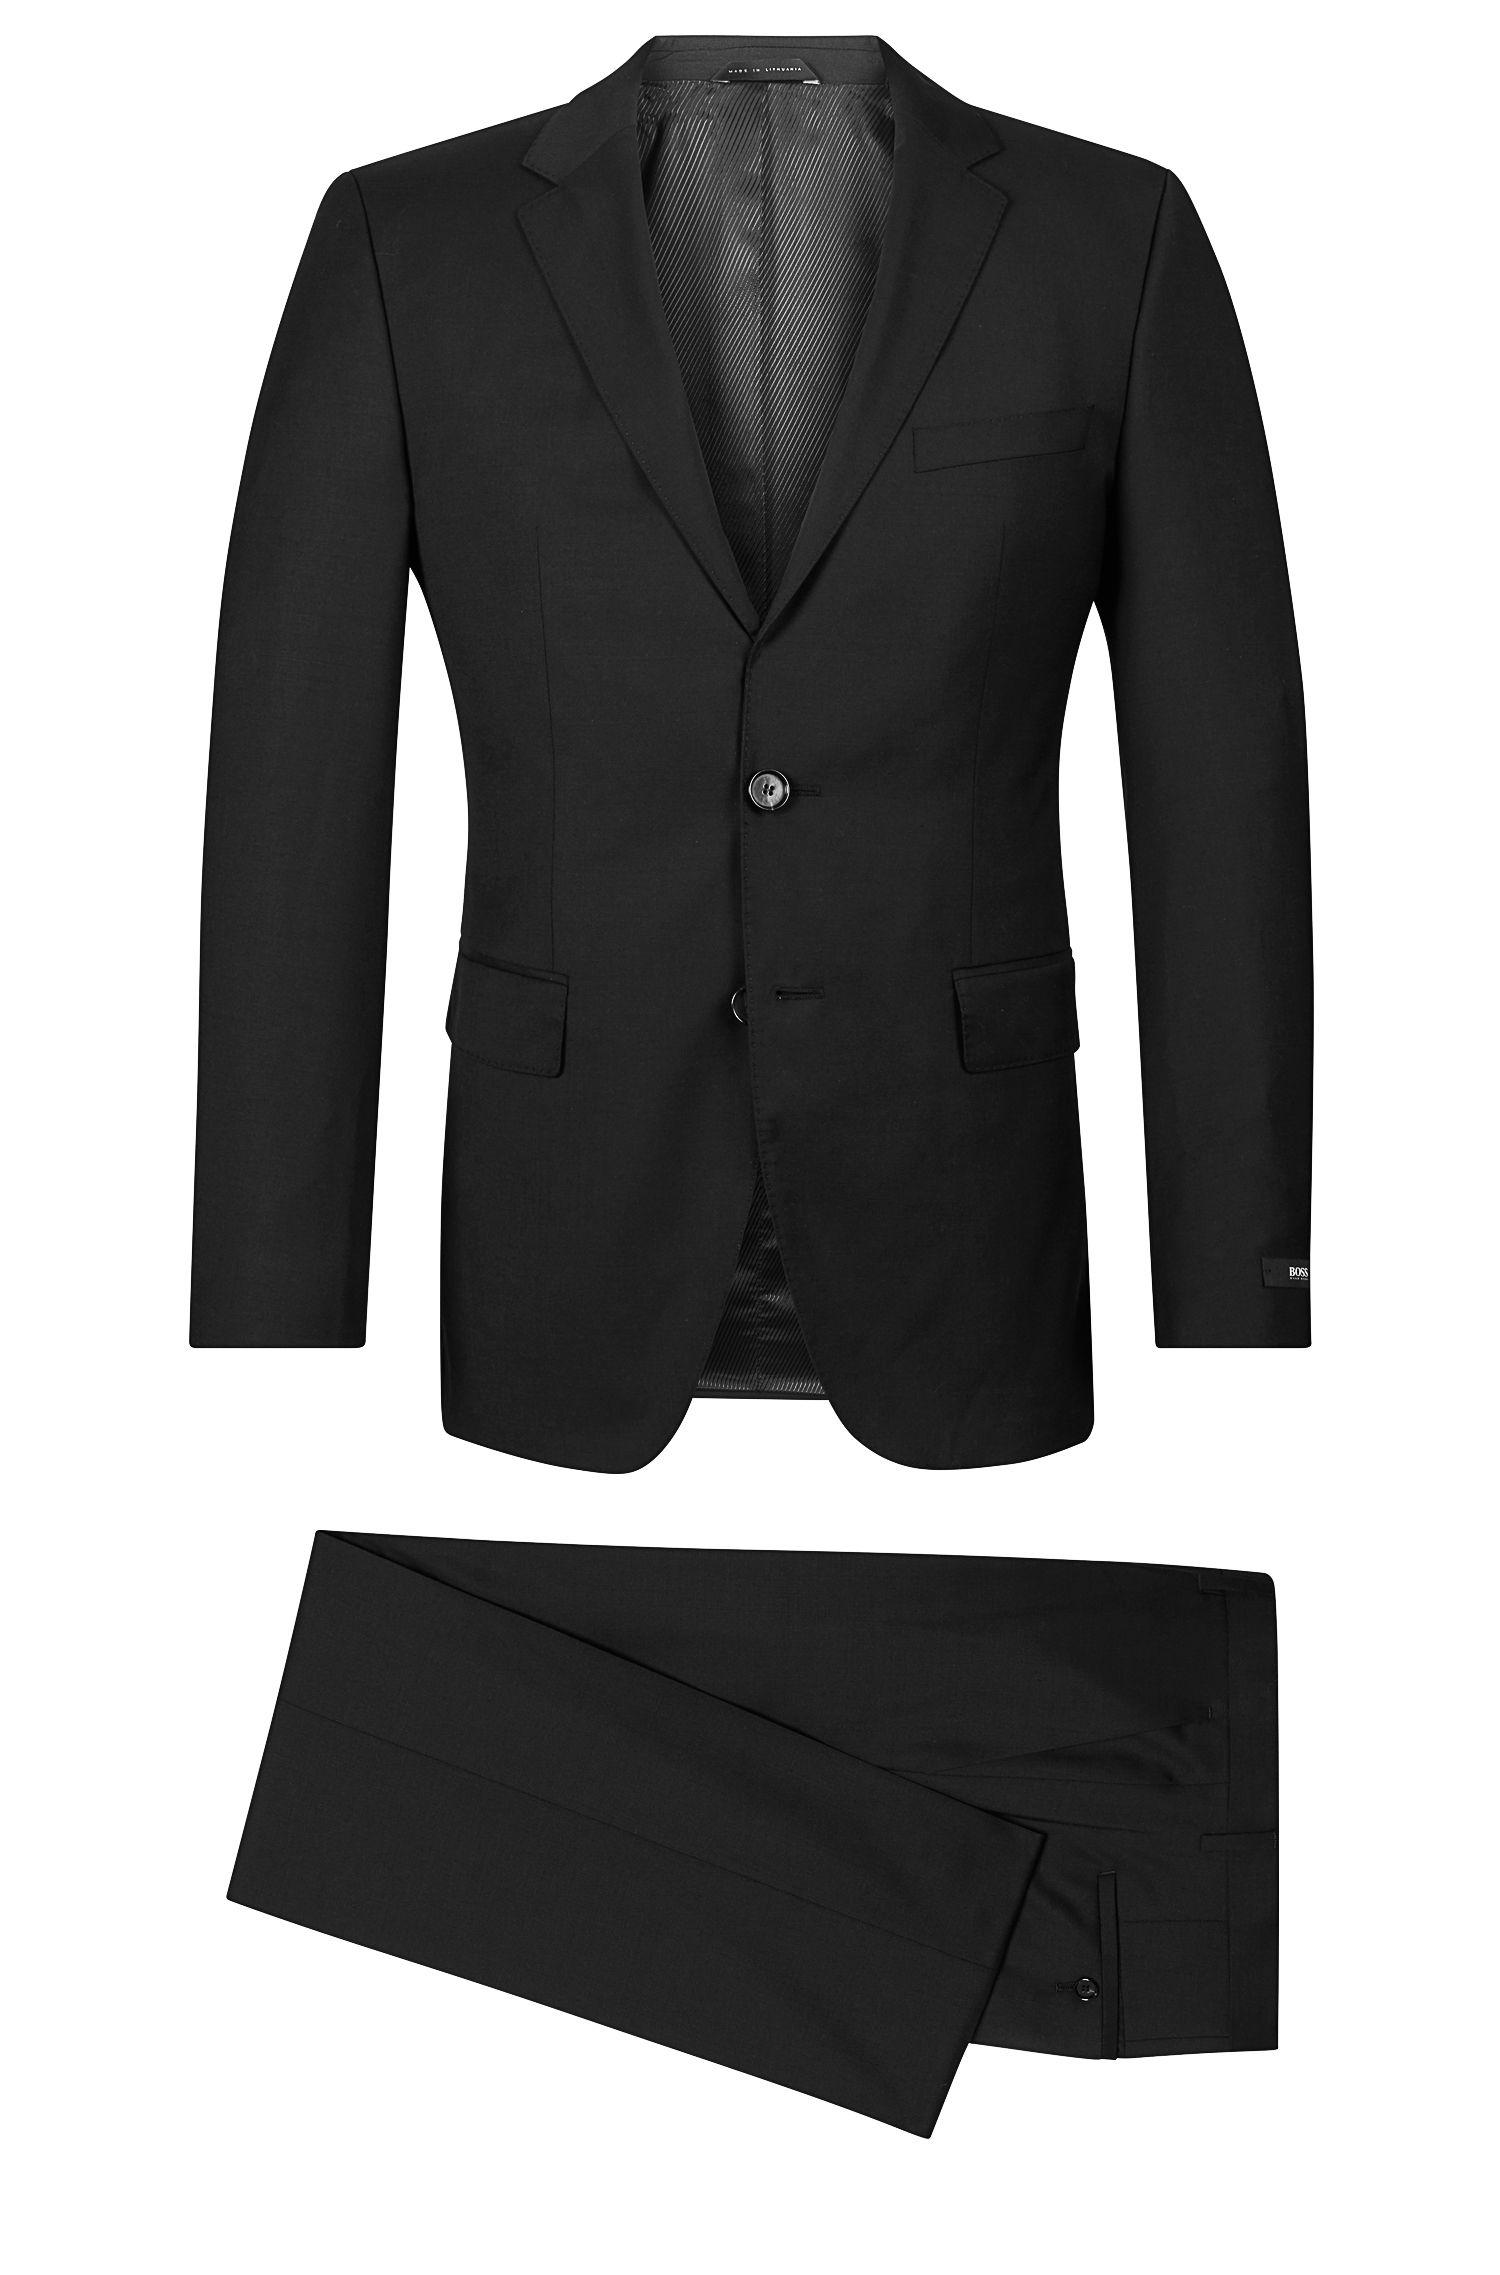 Super 120 Italian Virgin Wool Suit, Regular Fit | The James/Sharp